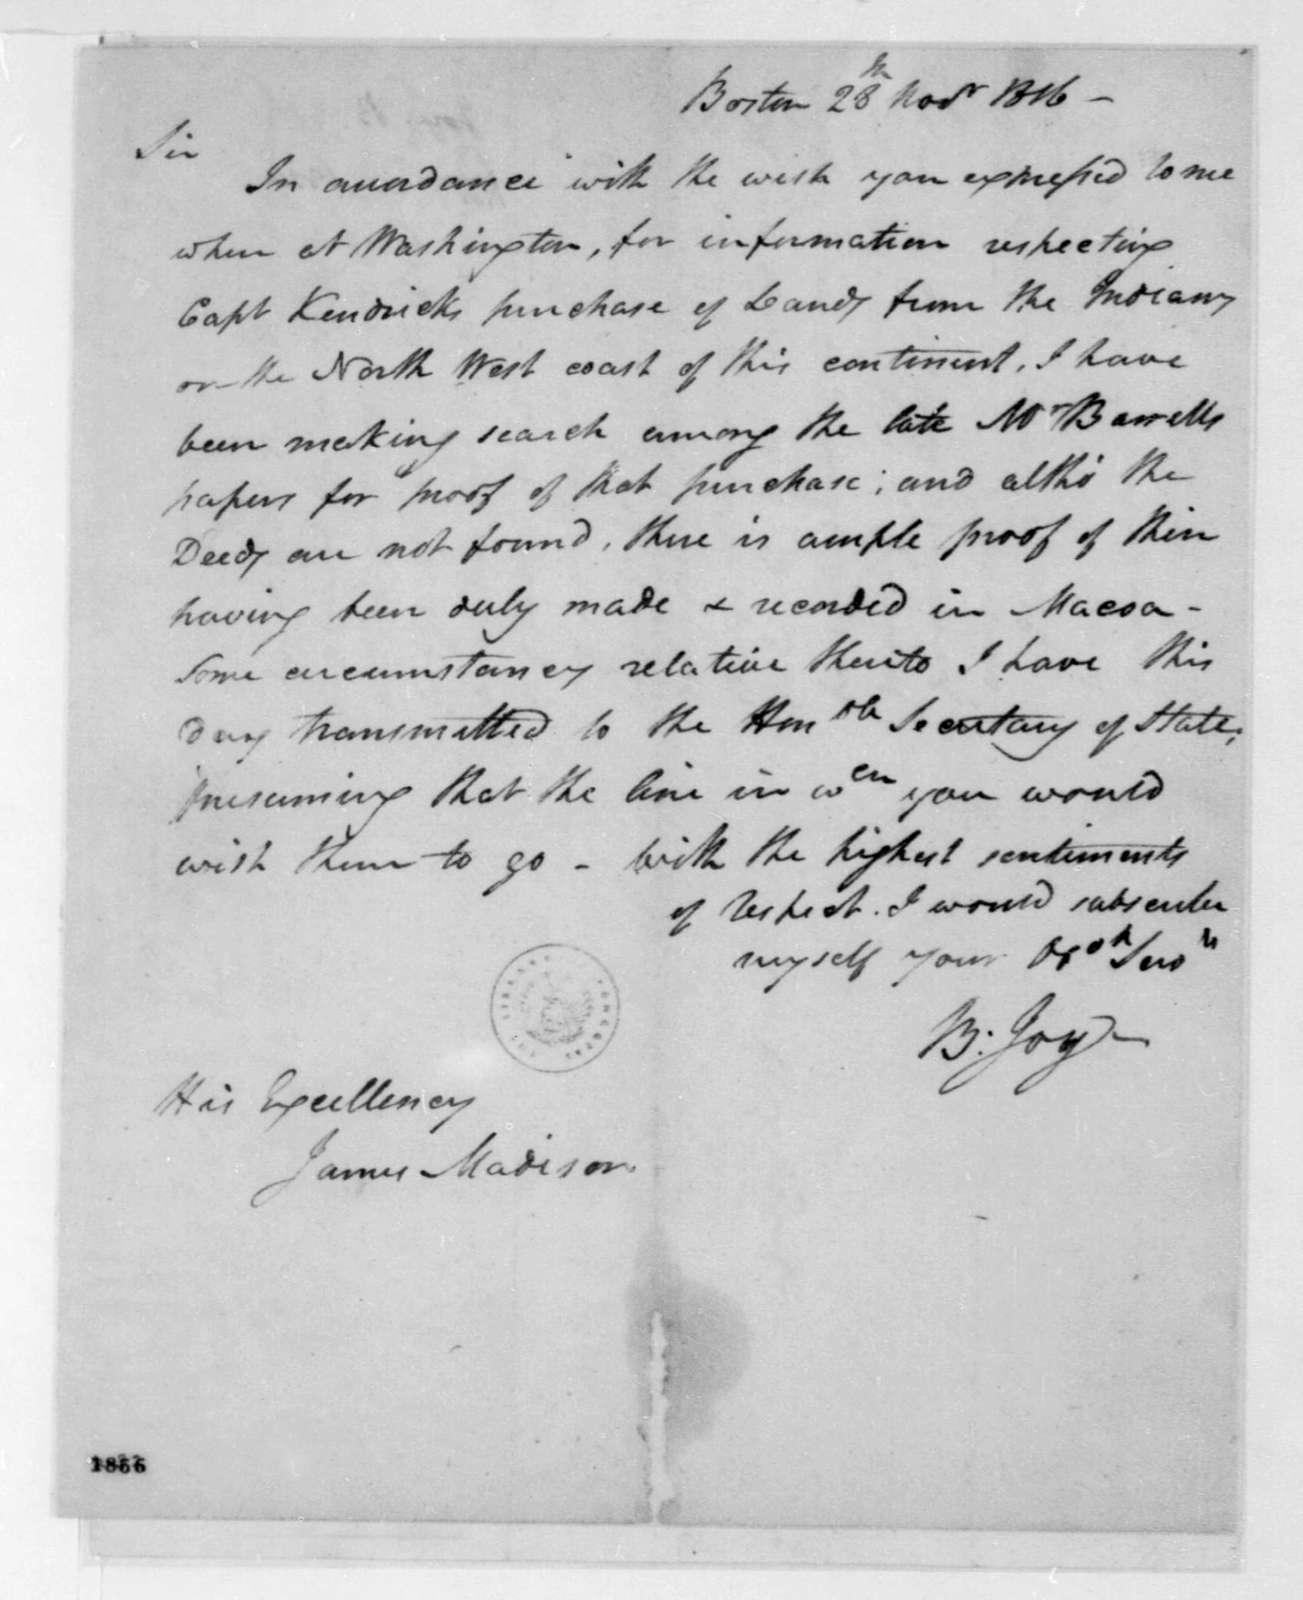 Benjamin Joy to James Madison, November 28, 1816.